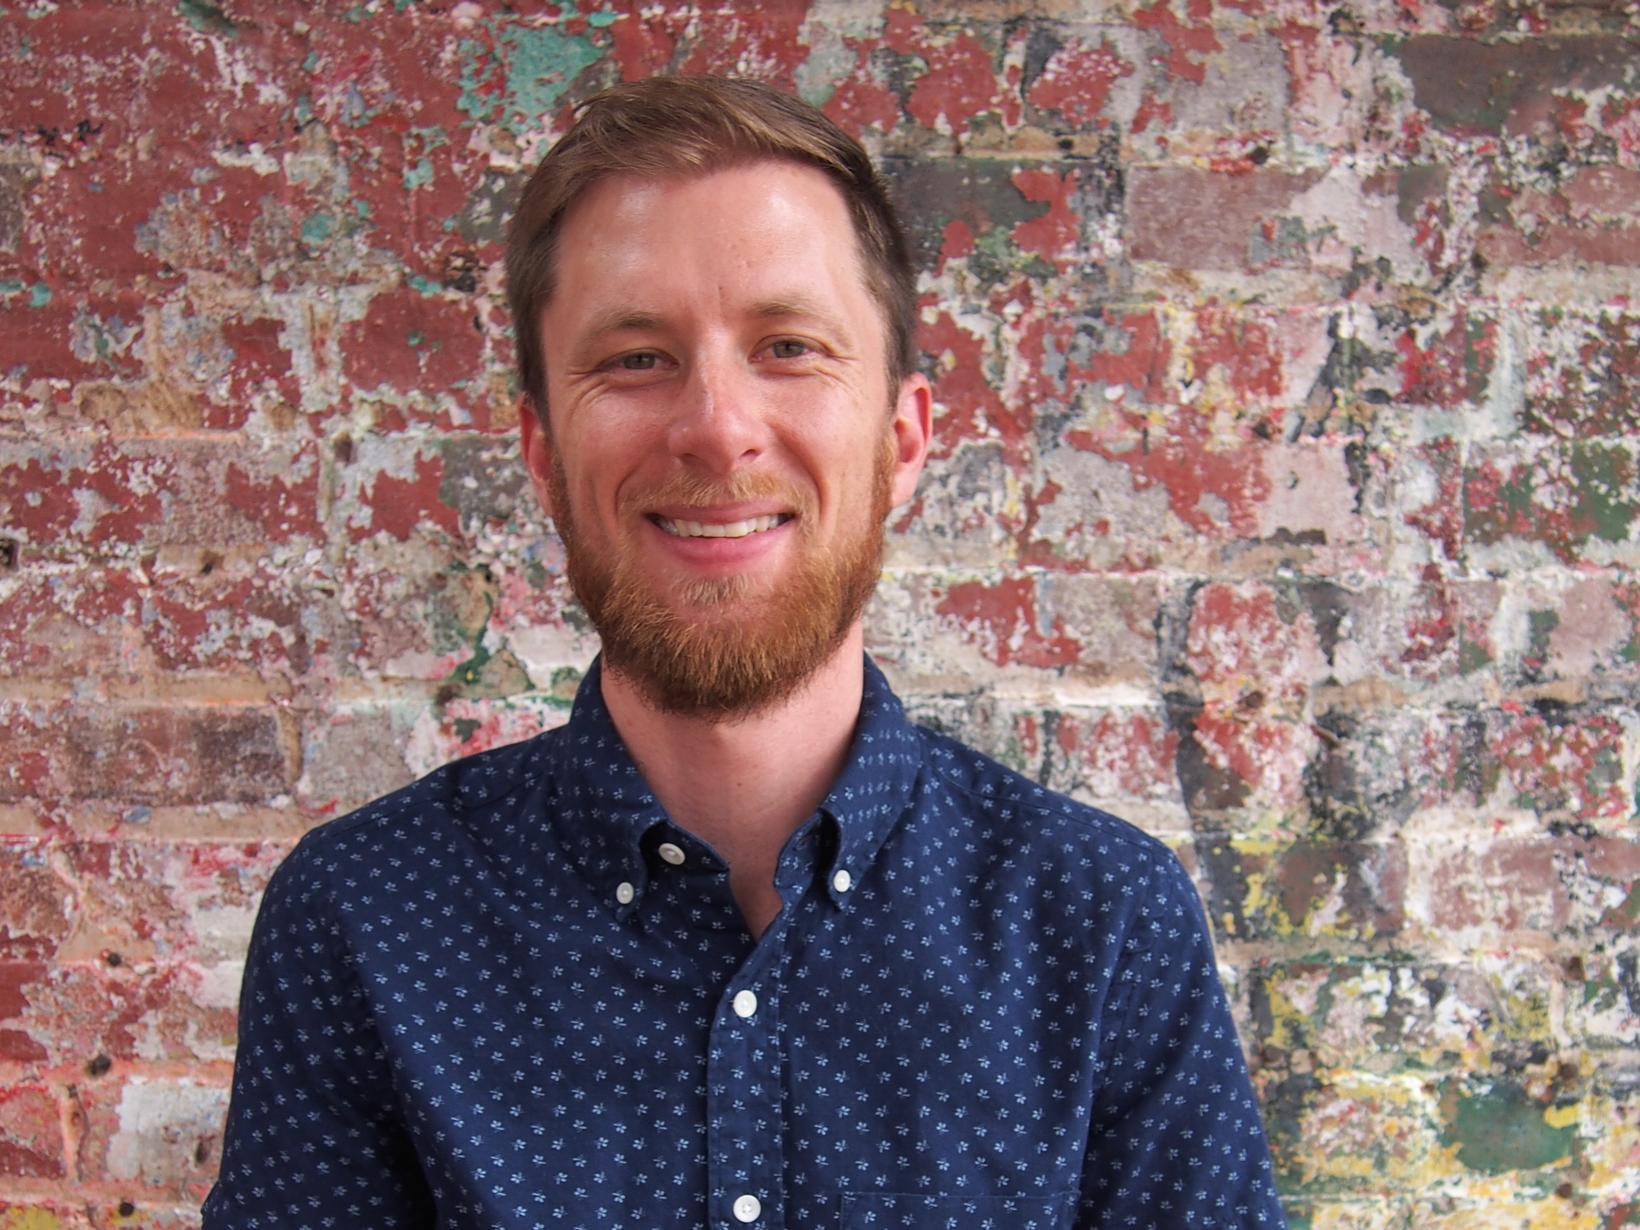 Paul from Charlotte, North Carolina, United States